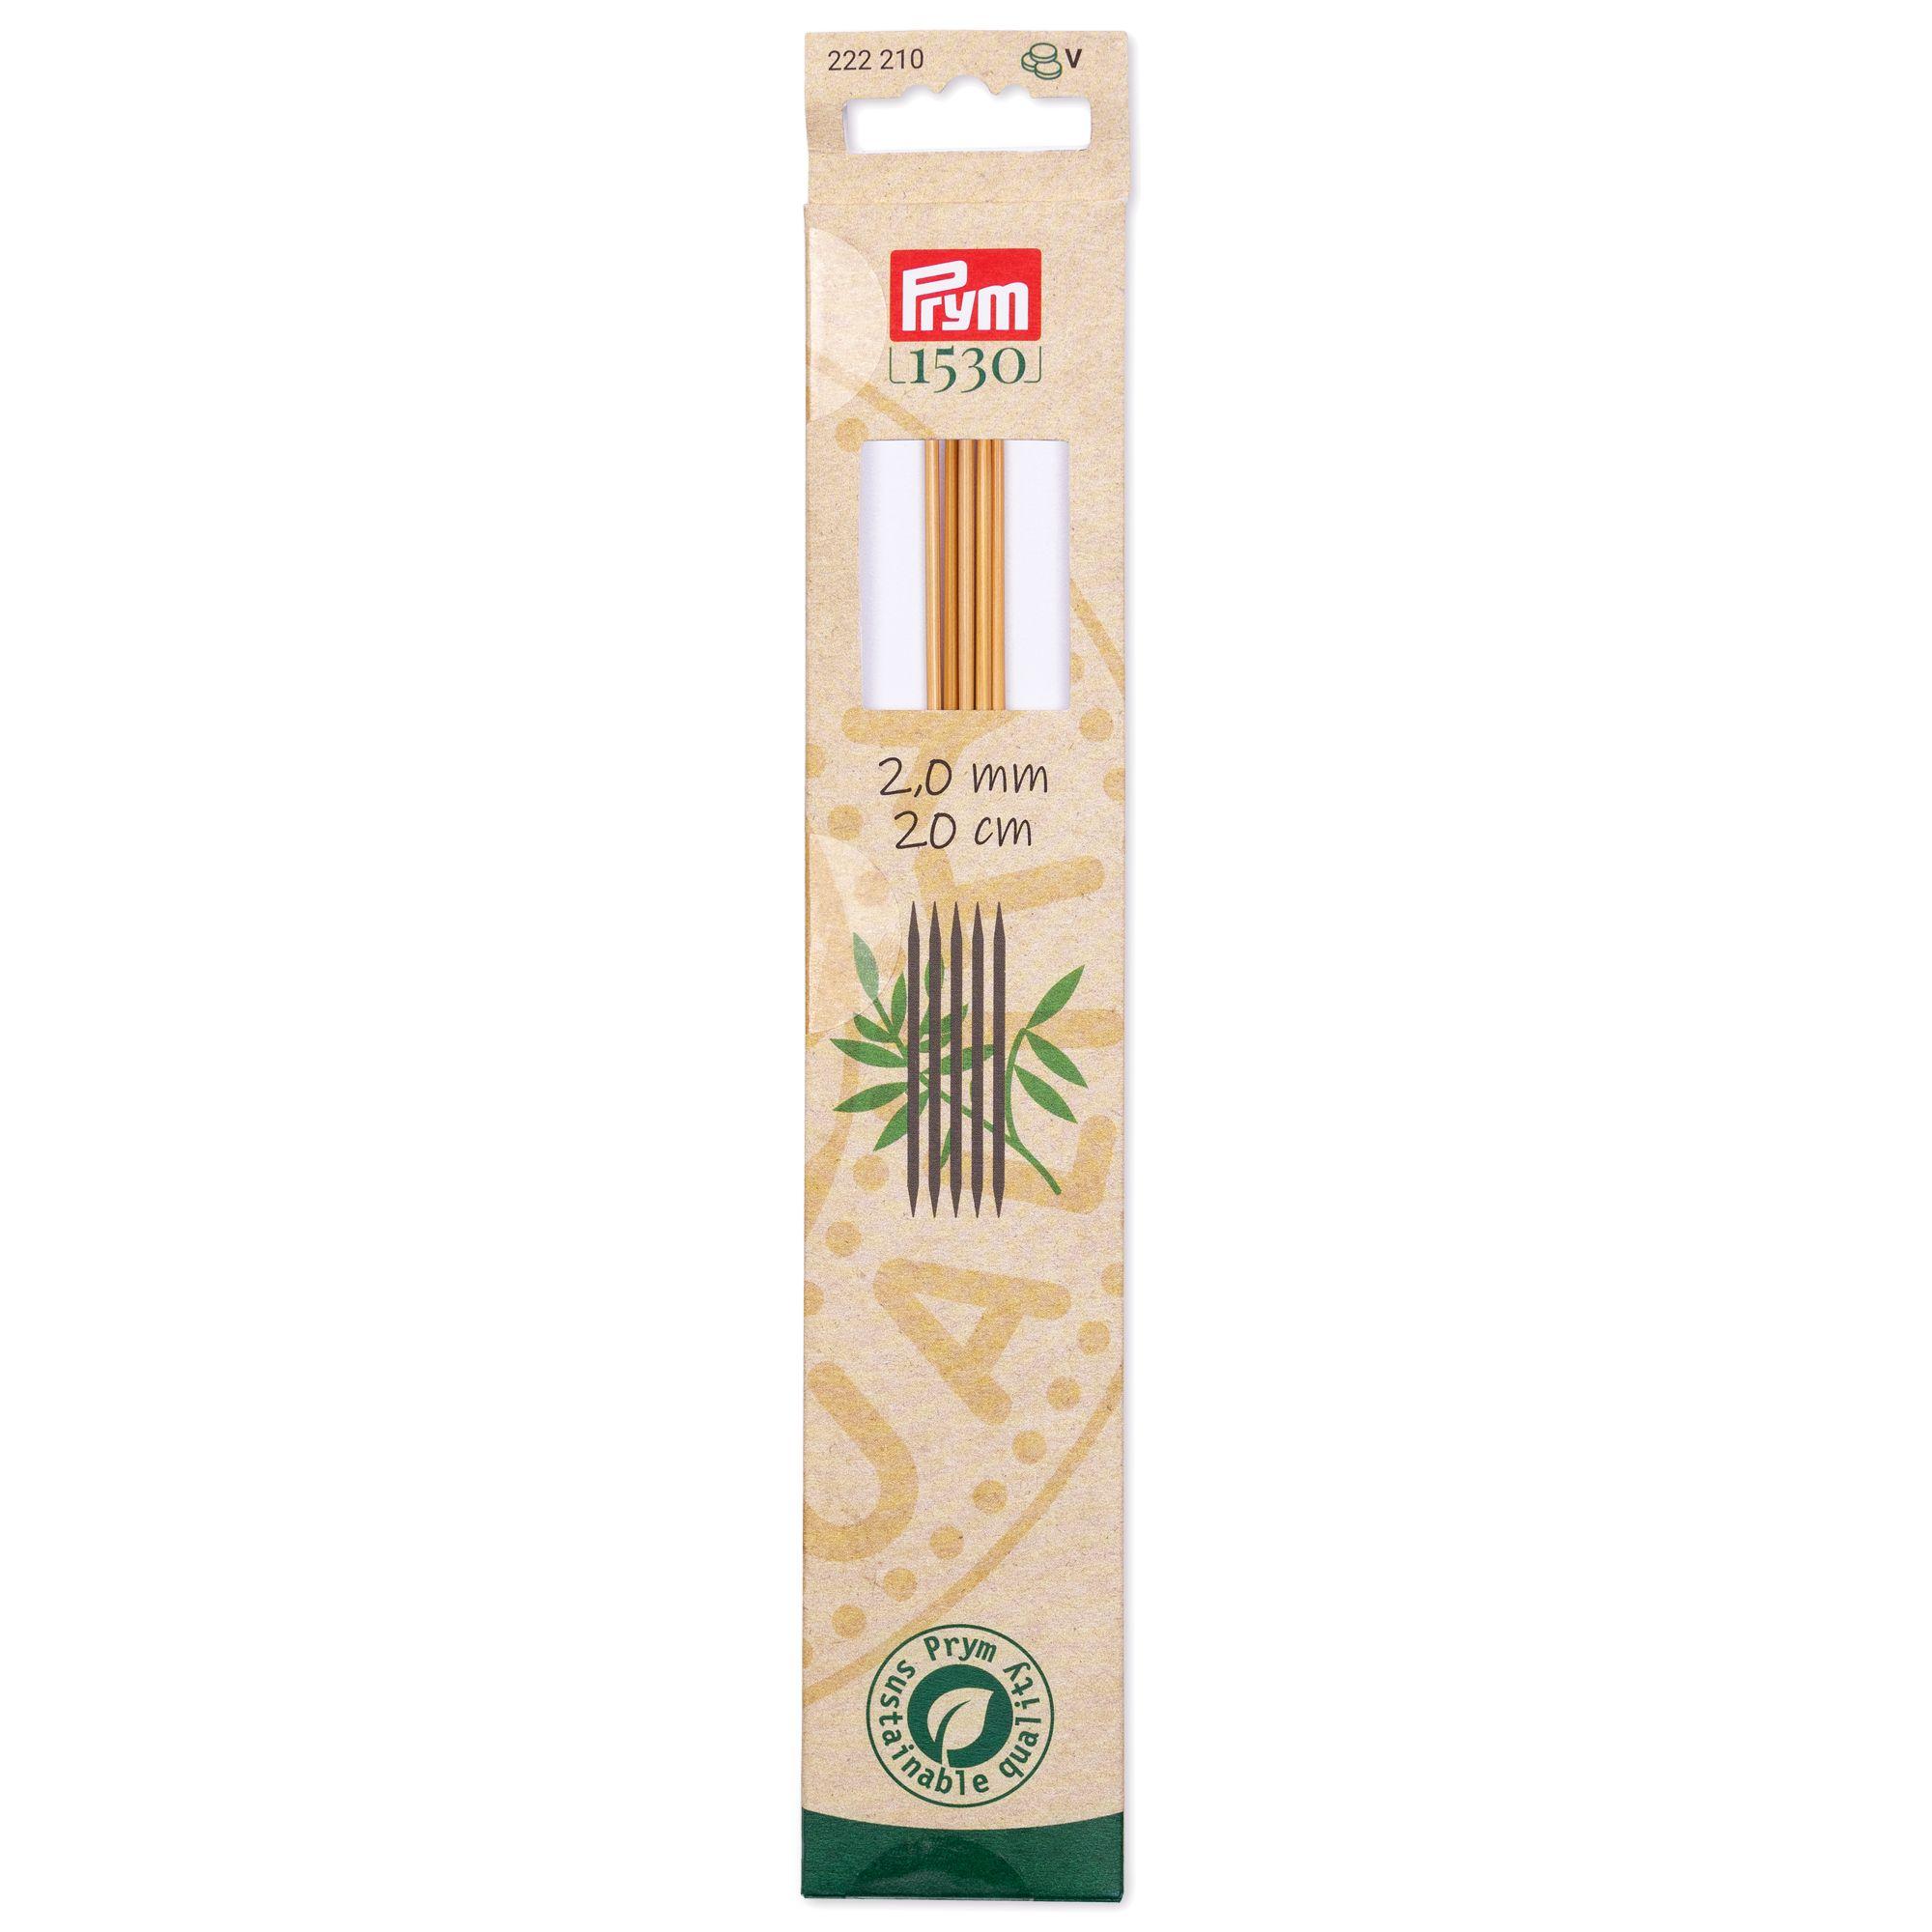 Prym 222210..222213 Strumpfstricknadeln Bambus